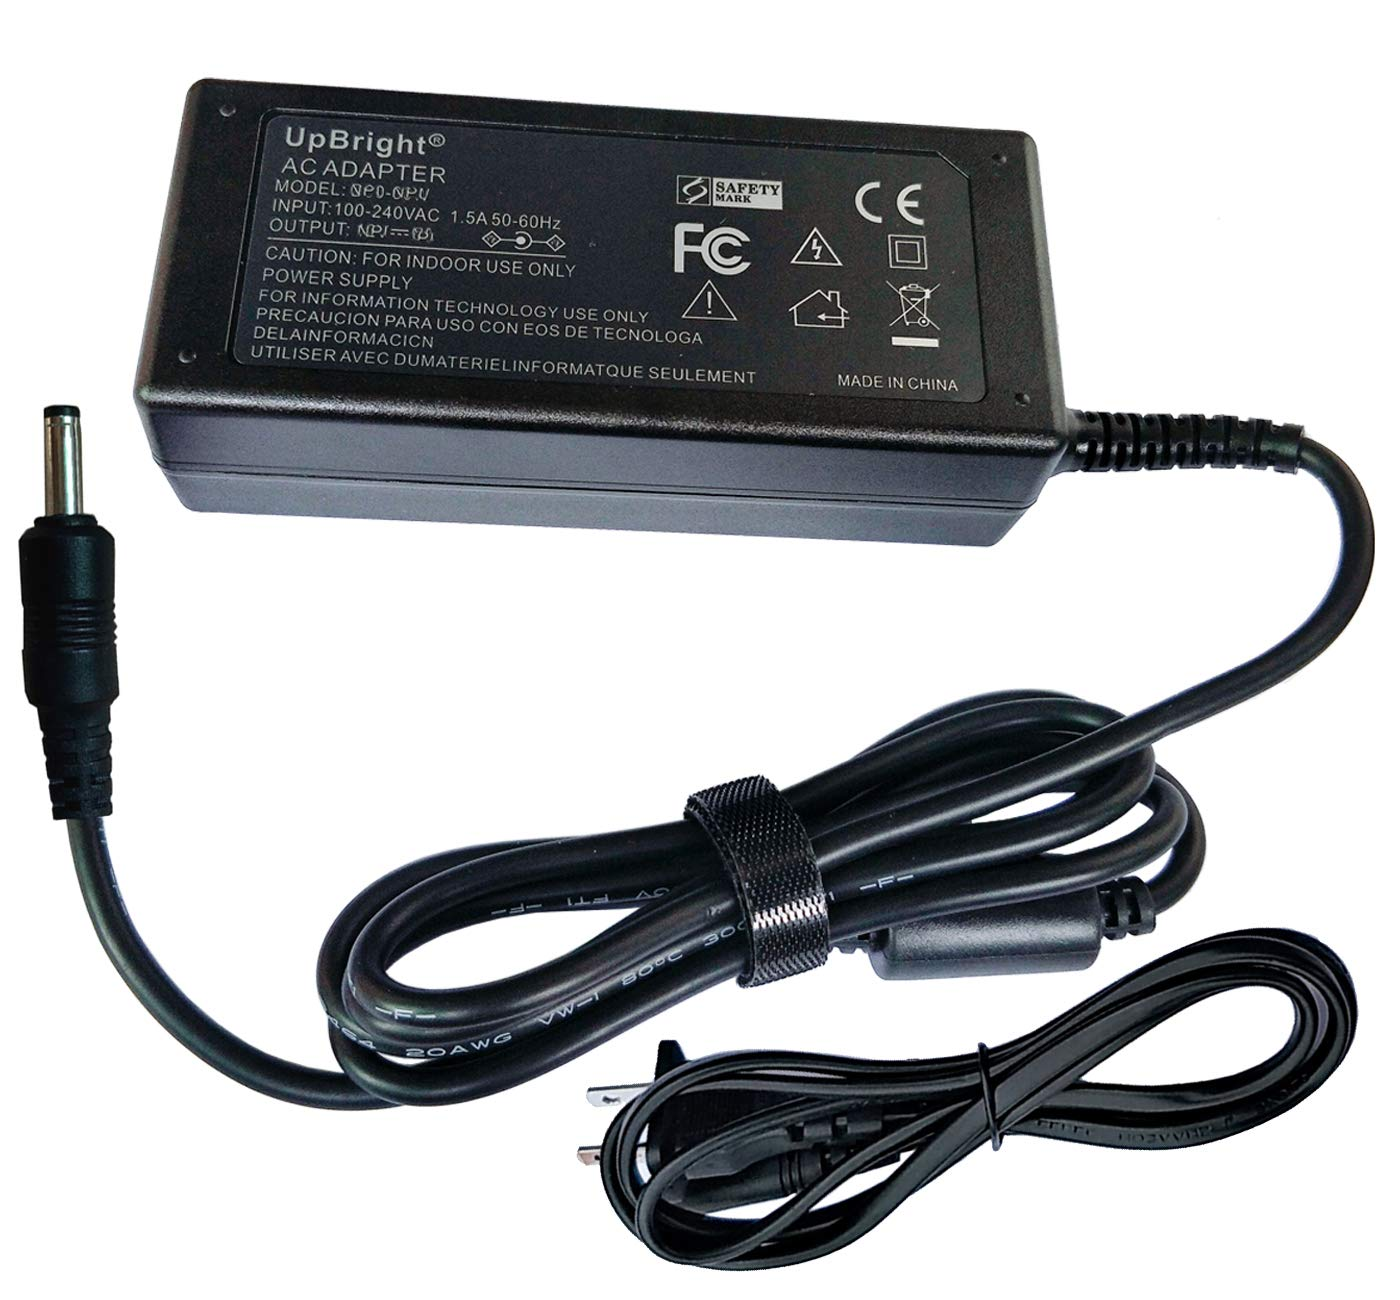 UpBright 18V AC/DC Adapter Compatible with Razer Leviathan RC30-012601 Elite Gaming Music SoundBar RZ05-01260100 RZ05-01260100-R3U1 DYS650-180280W-K DYS650-180280-14704B 18VDC 2.8A - 3.5A Power Cord